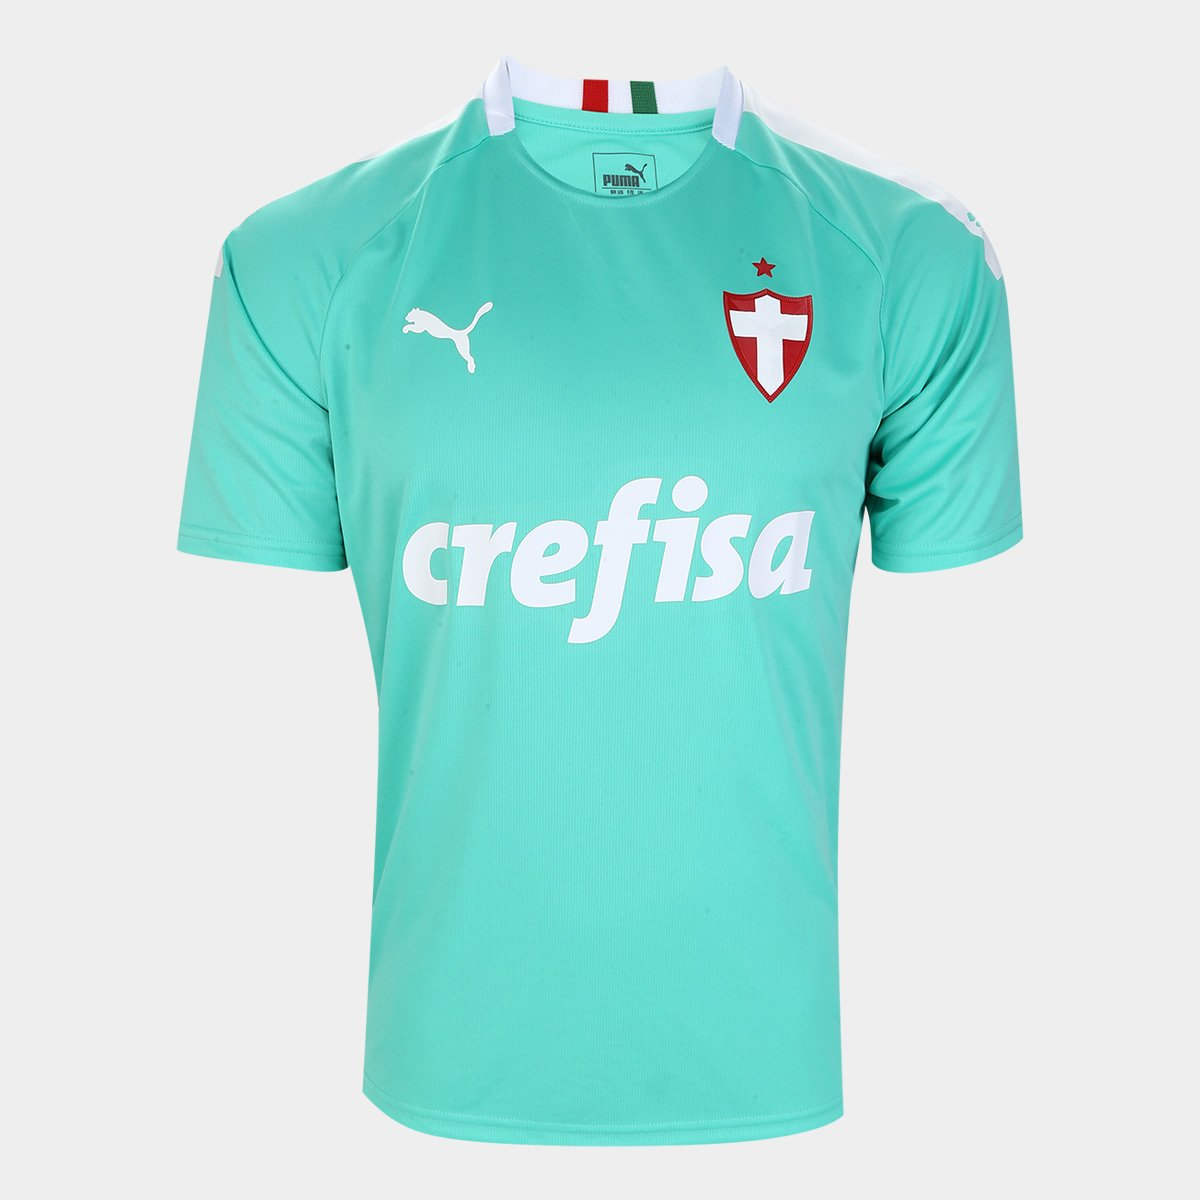 músculo Bolsa Comercio  Camisa Palmeiras III 19/20 s/n° - Torcedor Puma Masculina - Verde água |  Netshoes